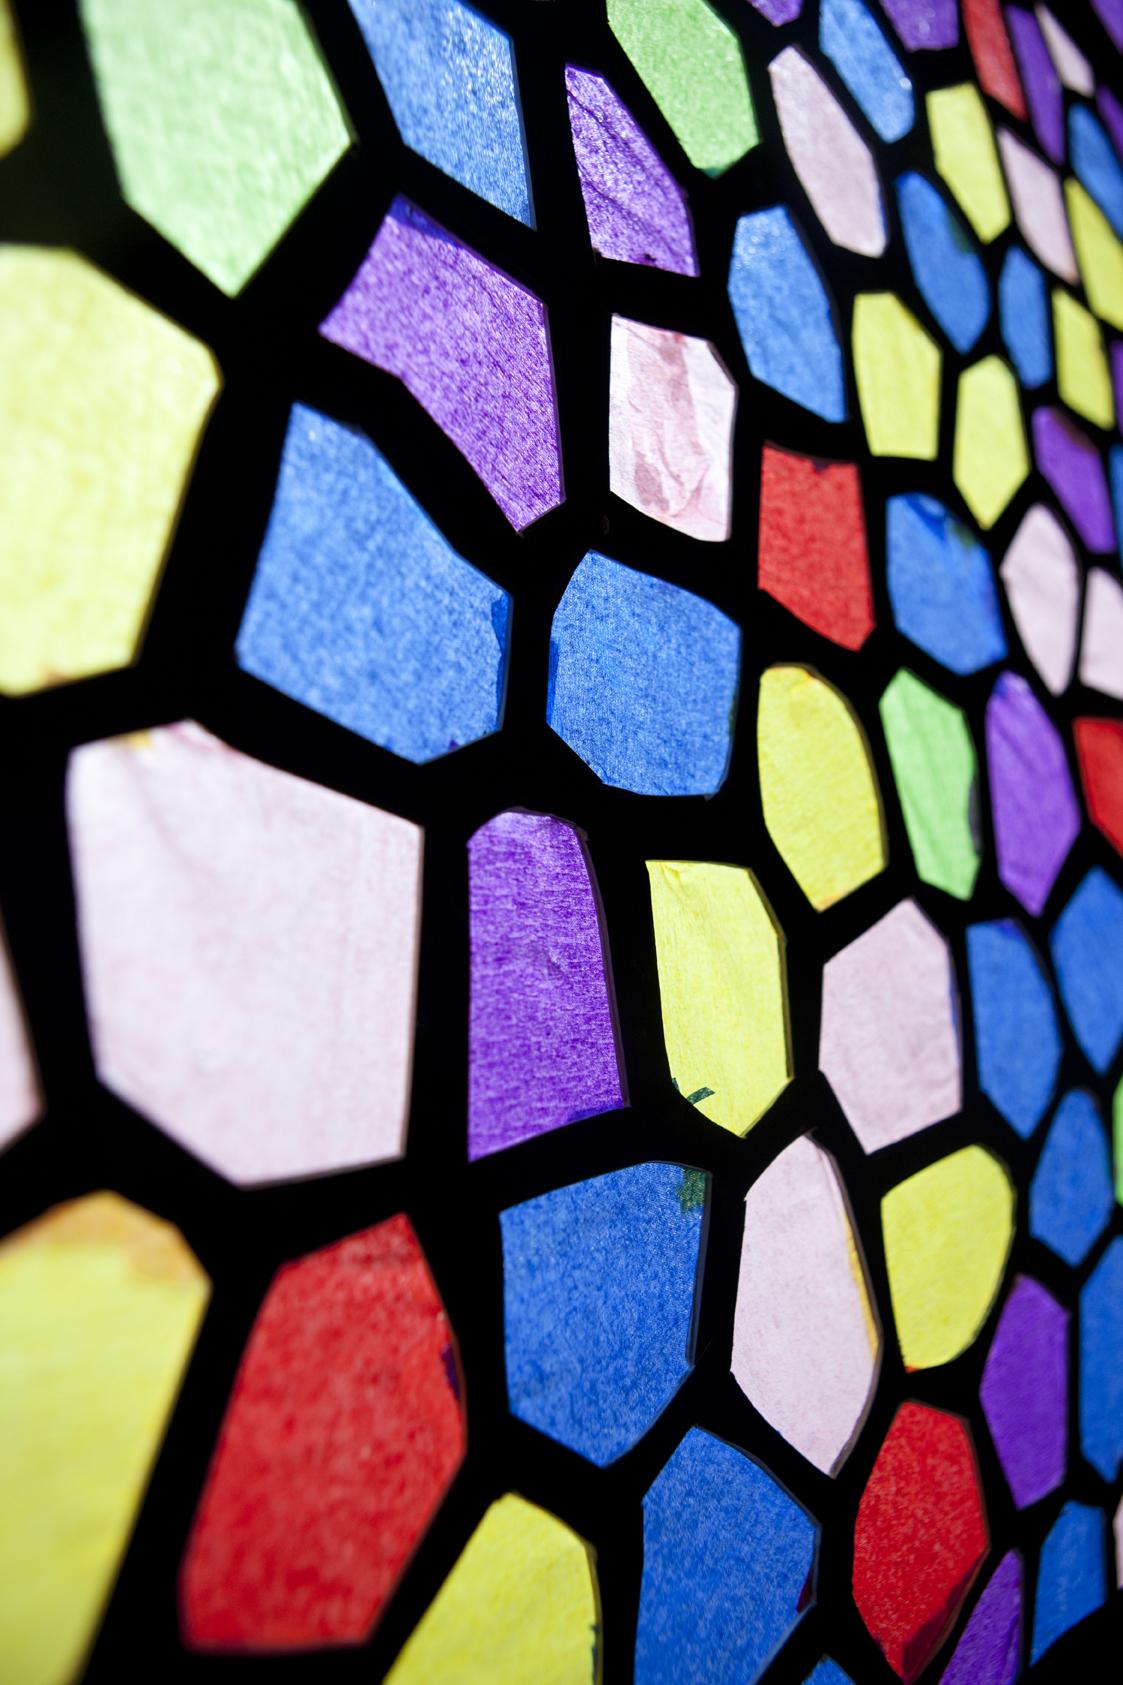 R.O'C. & L.T. Three works 2011 06.jpg